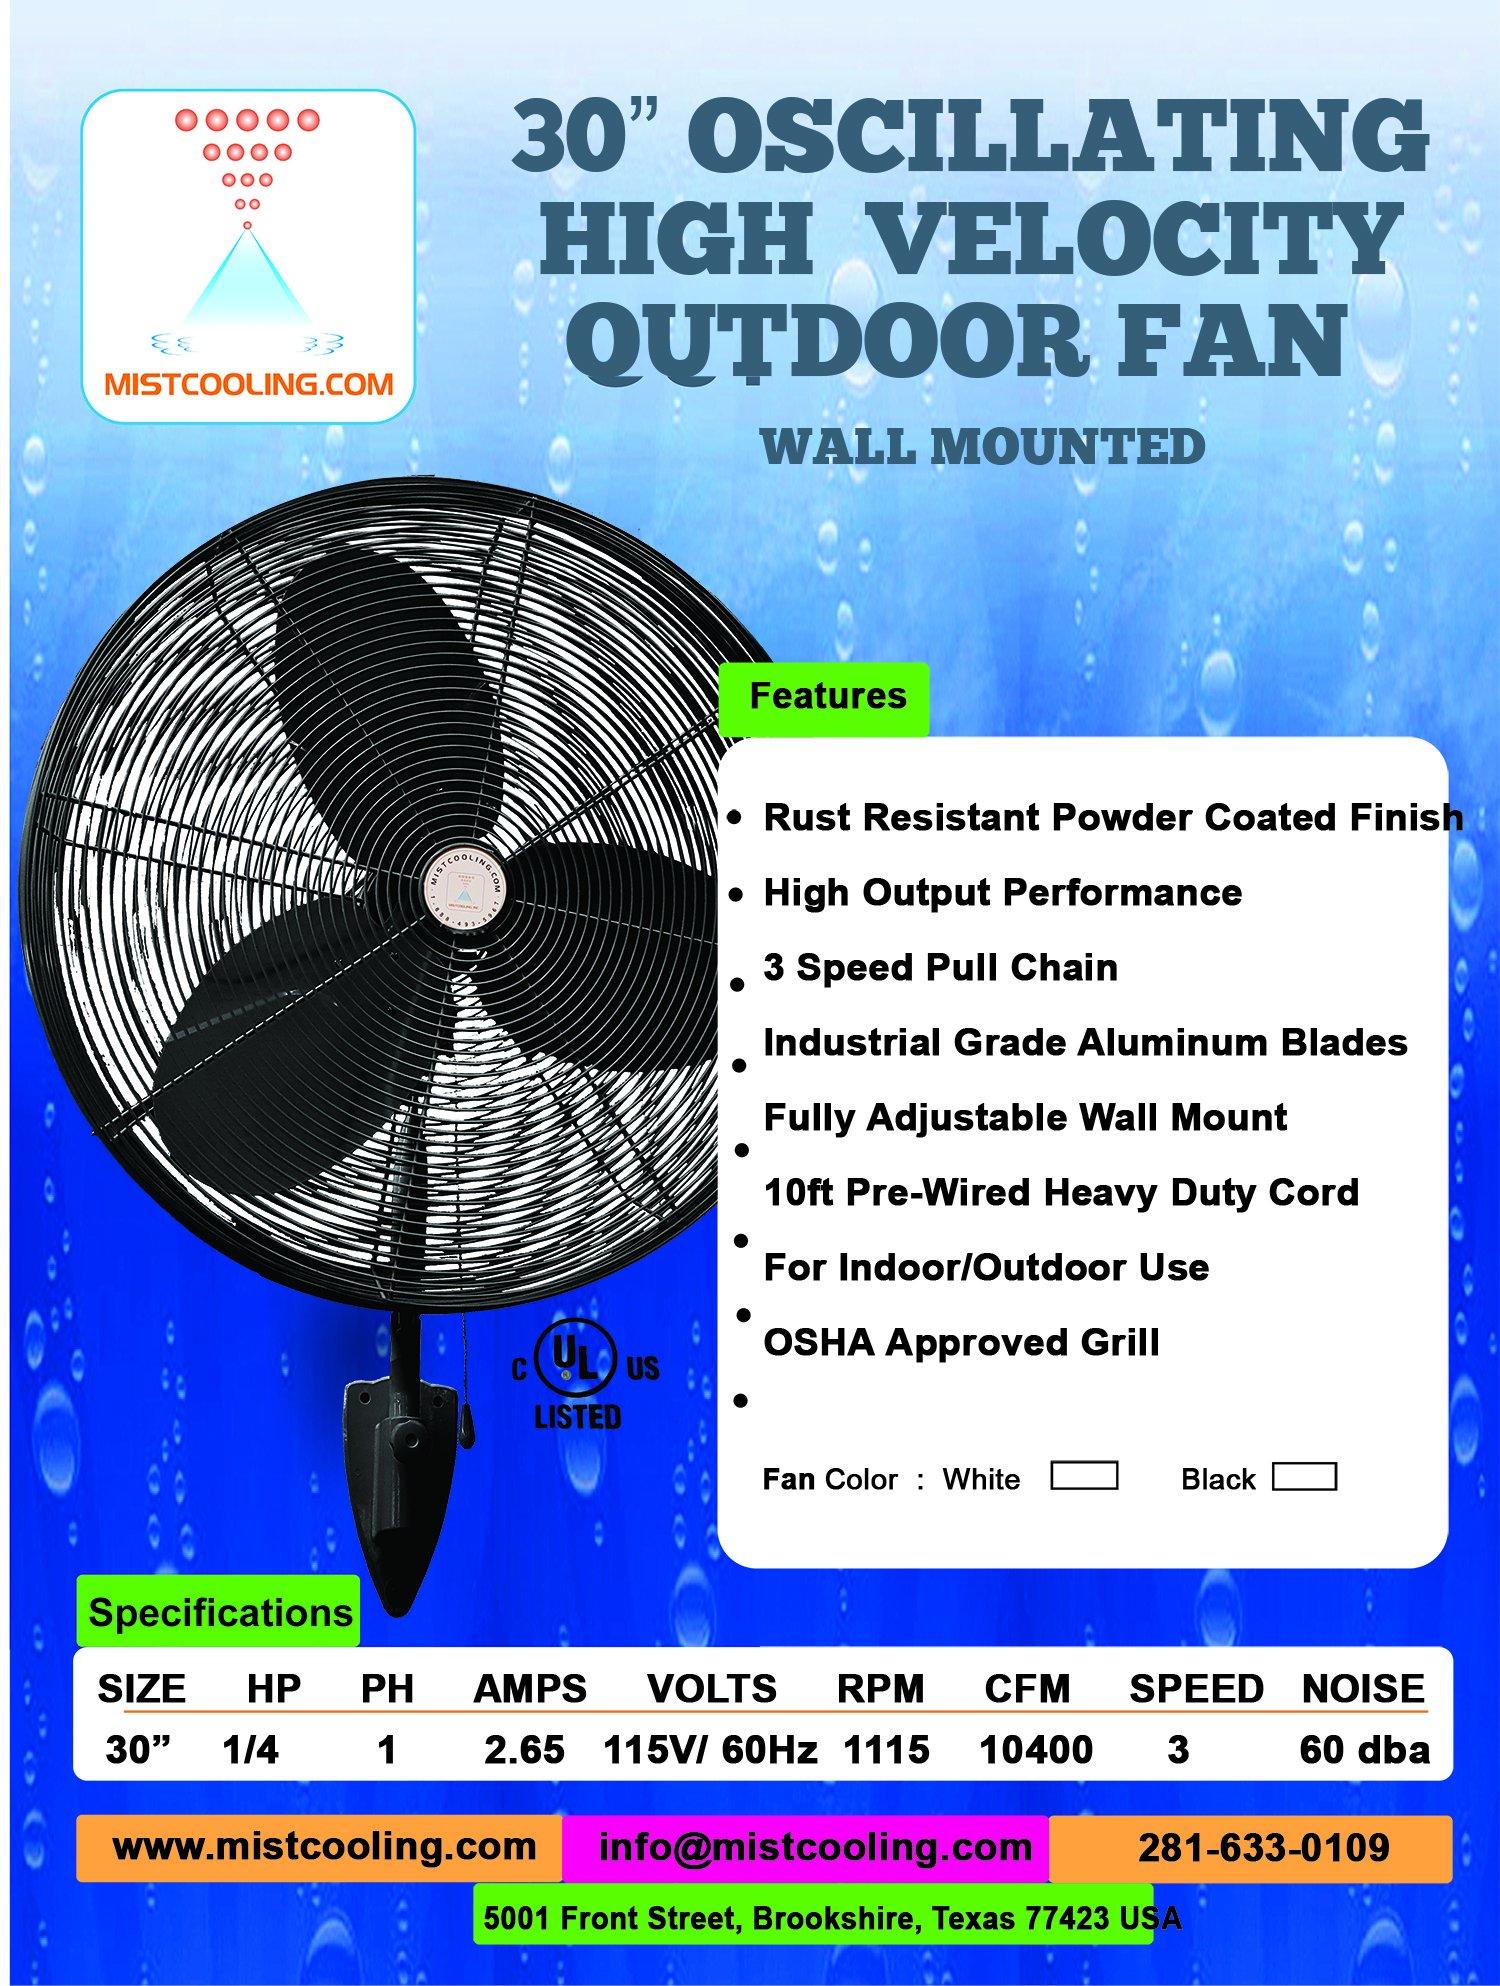 30'' OSC Misting Fan Kit - High Pressure 1500 PSI Misting Pump - Stainless Steel Misting Ring - For Warehouse Cooling, Industrial Misting, Outdoor Restaurant Cooling … (30'' OSC 2 - Fans Black)